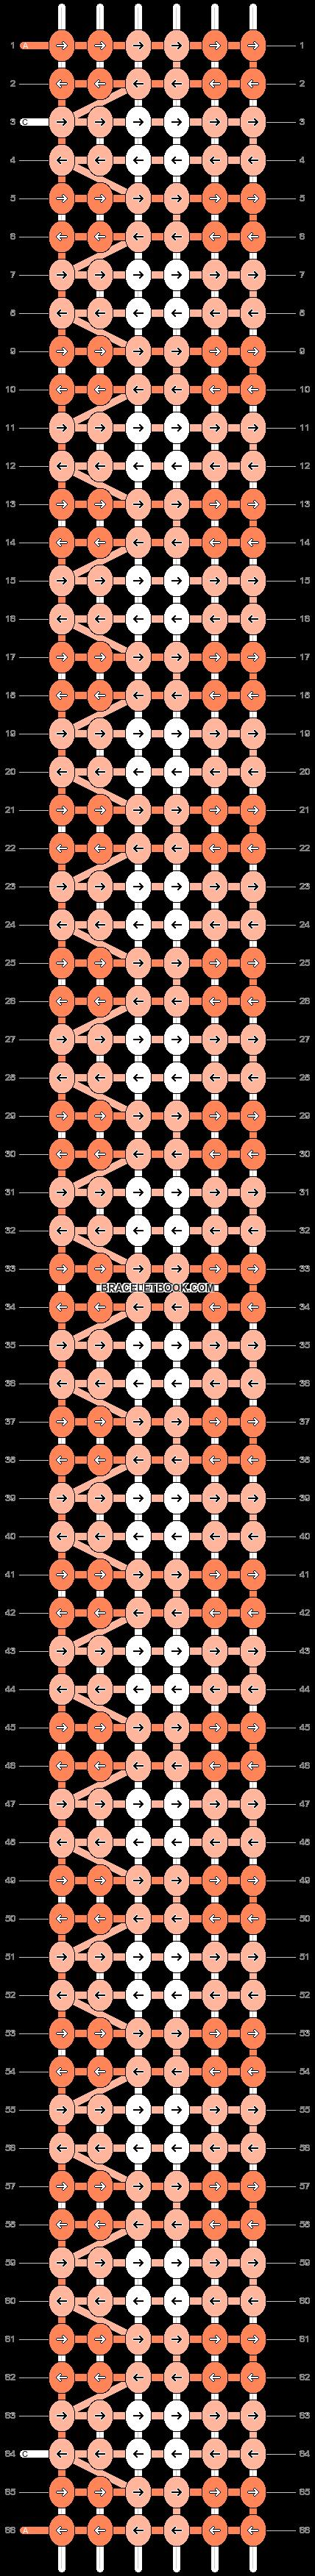 Alpha pattern #80755 pattern